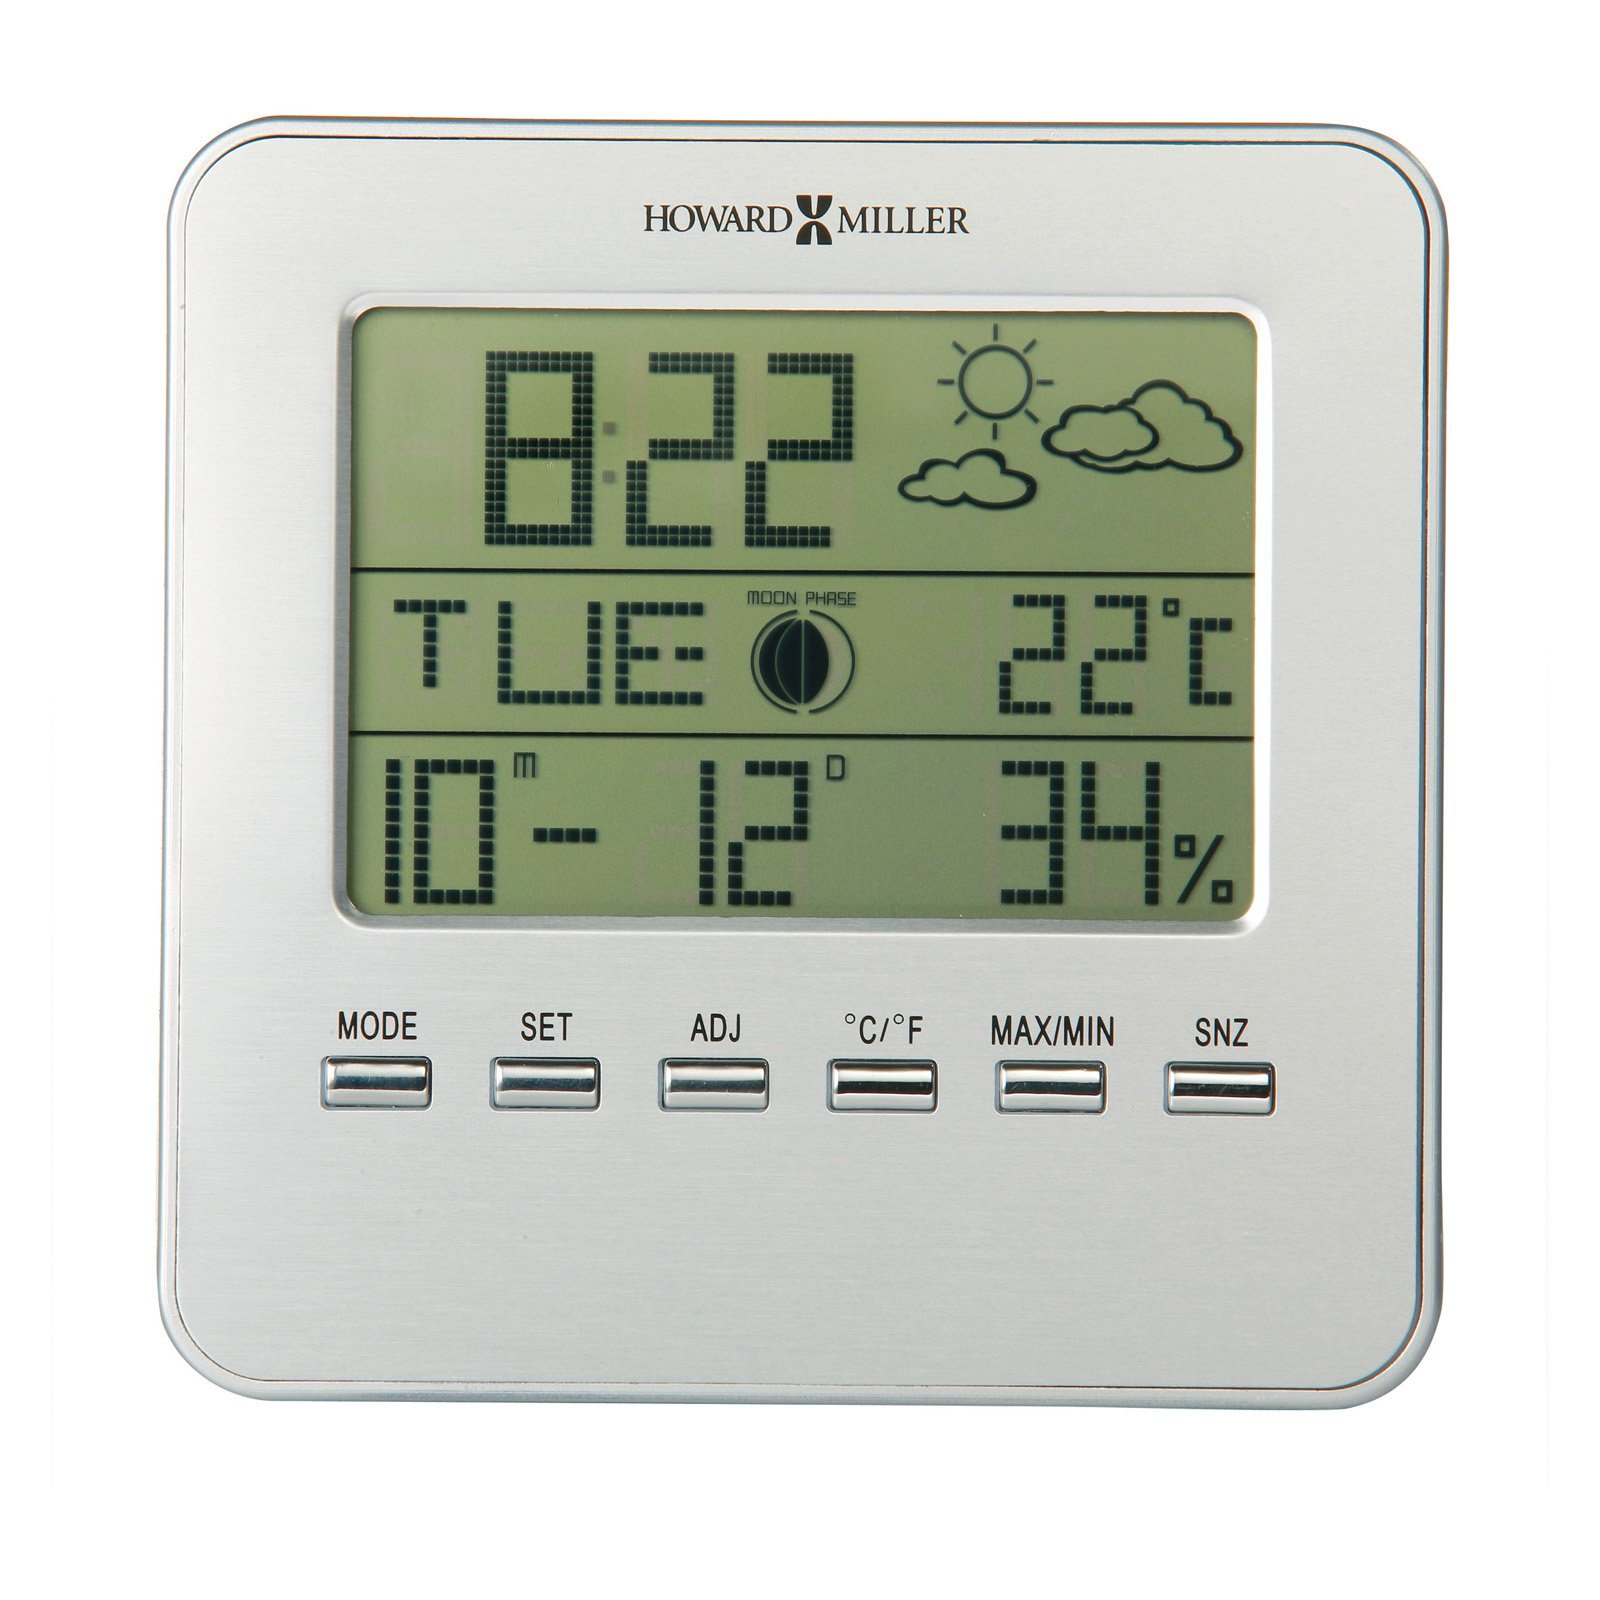 Howard Miller 645-693 Weather View Desktop Clock by Howard Miller